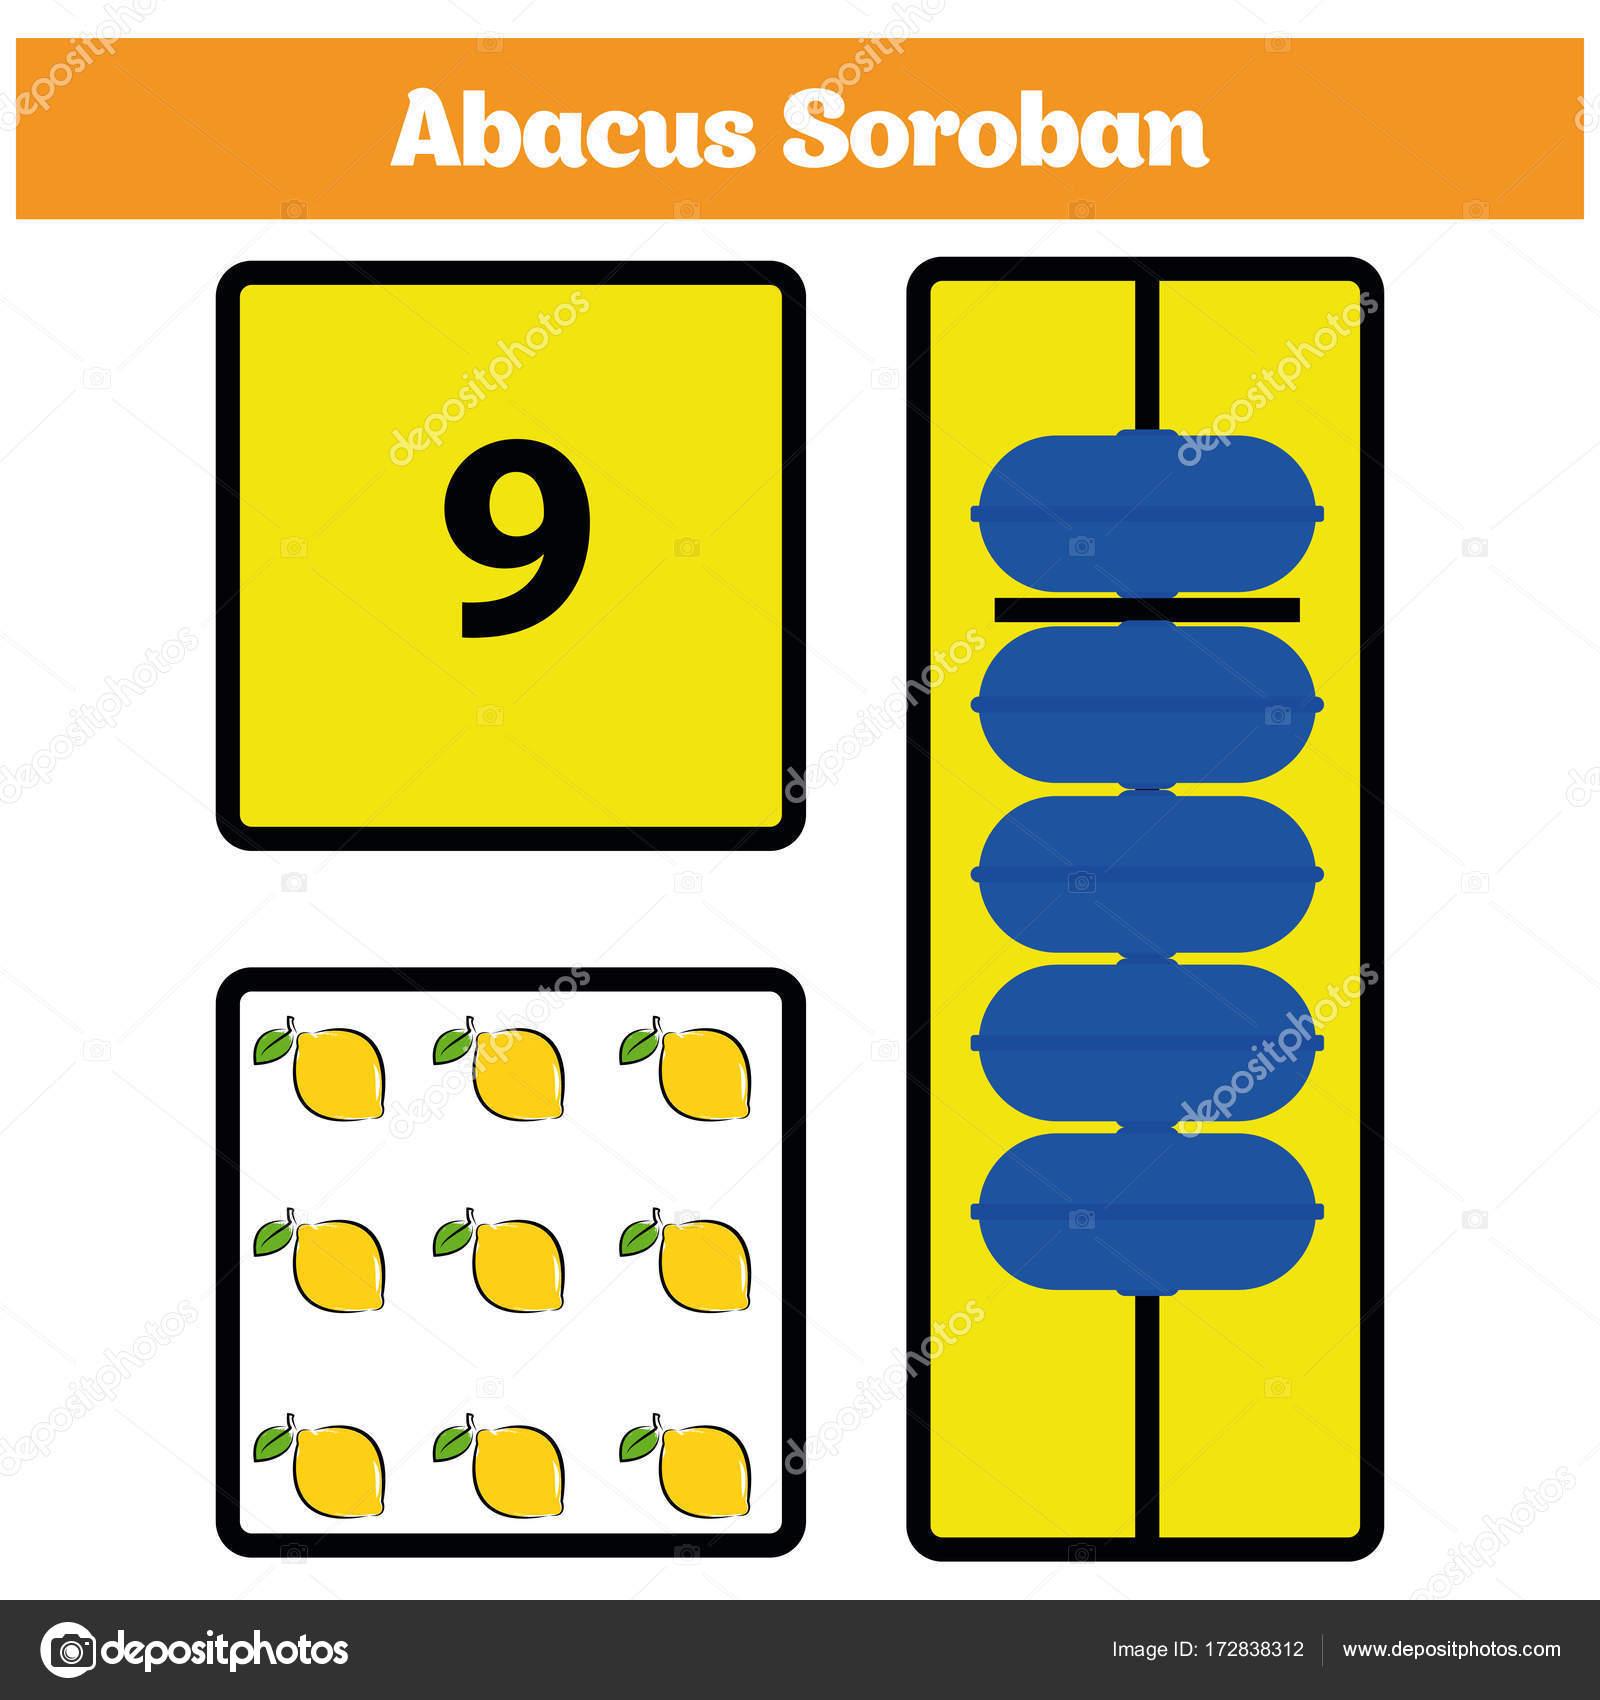 Abacus Soroban Kinder lernen Zahlen mit Abacus, Mathe Arbeitsblatt ...